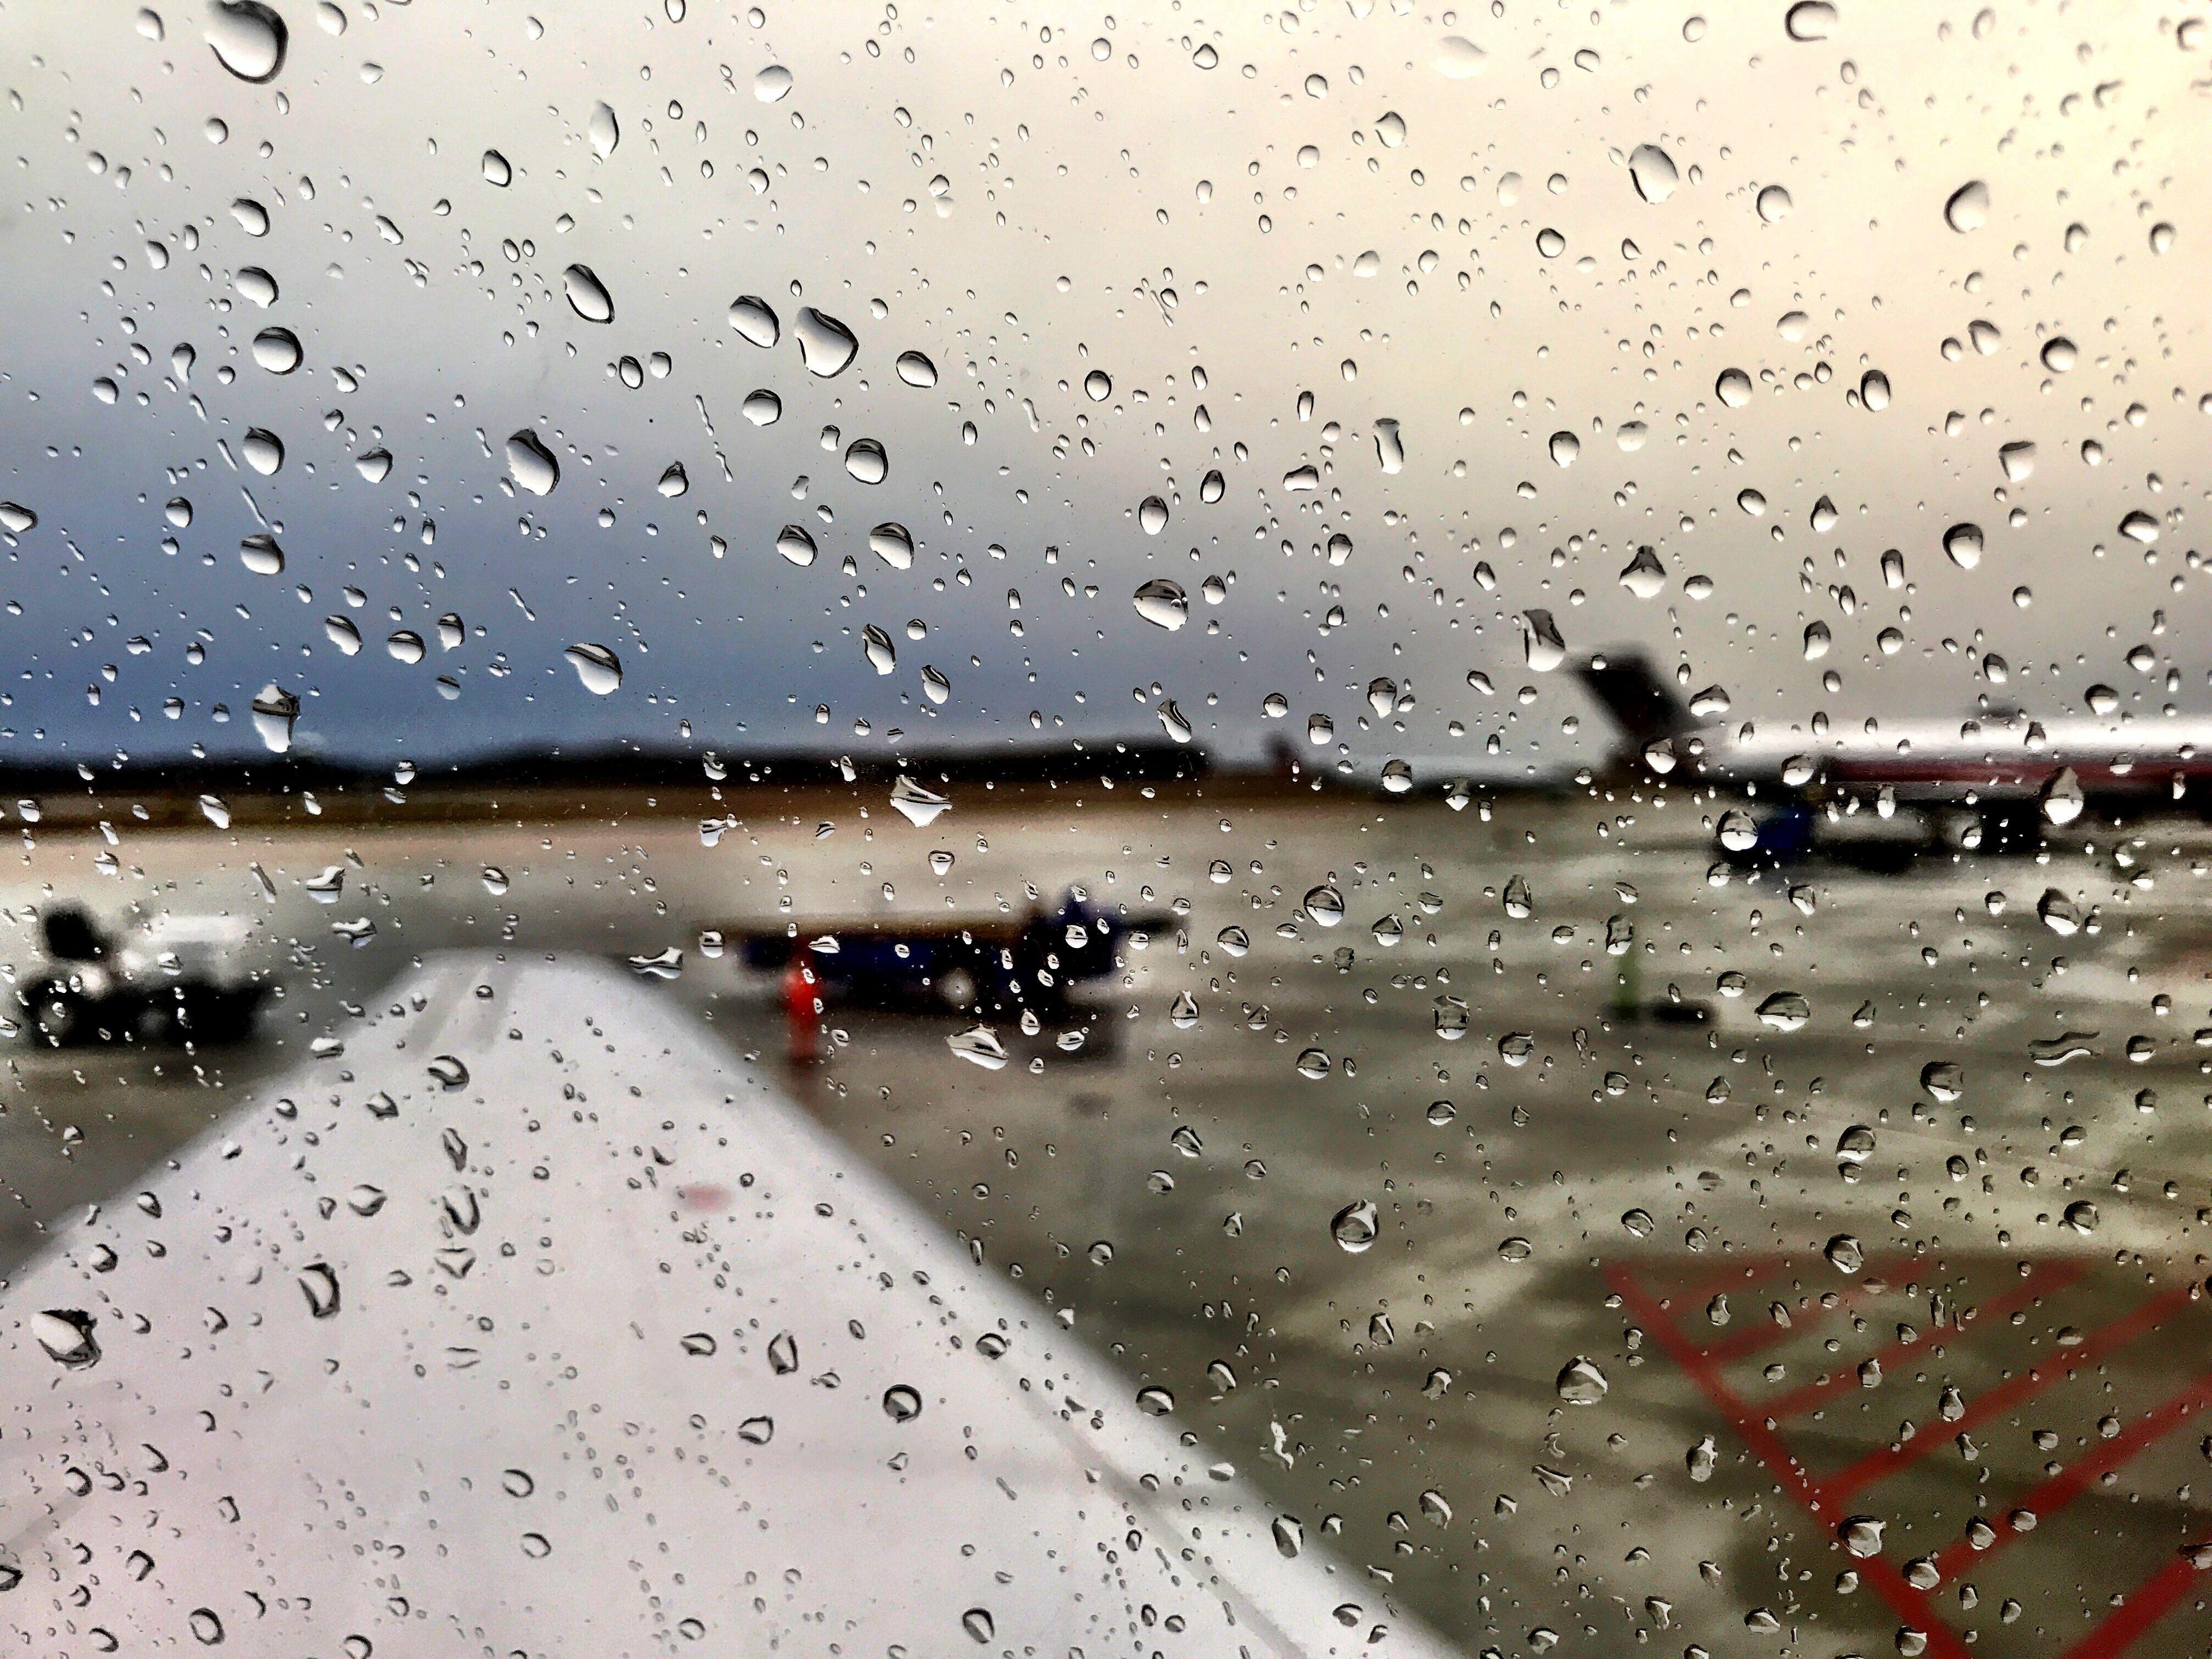 Raindrops on plane window. Rainy Monday. Plane window